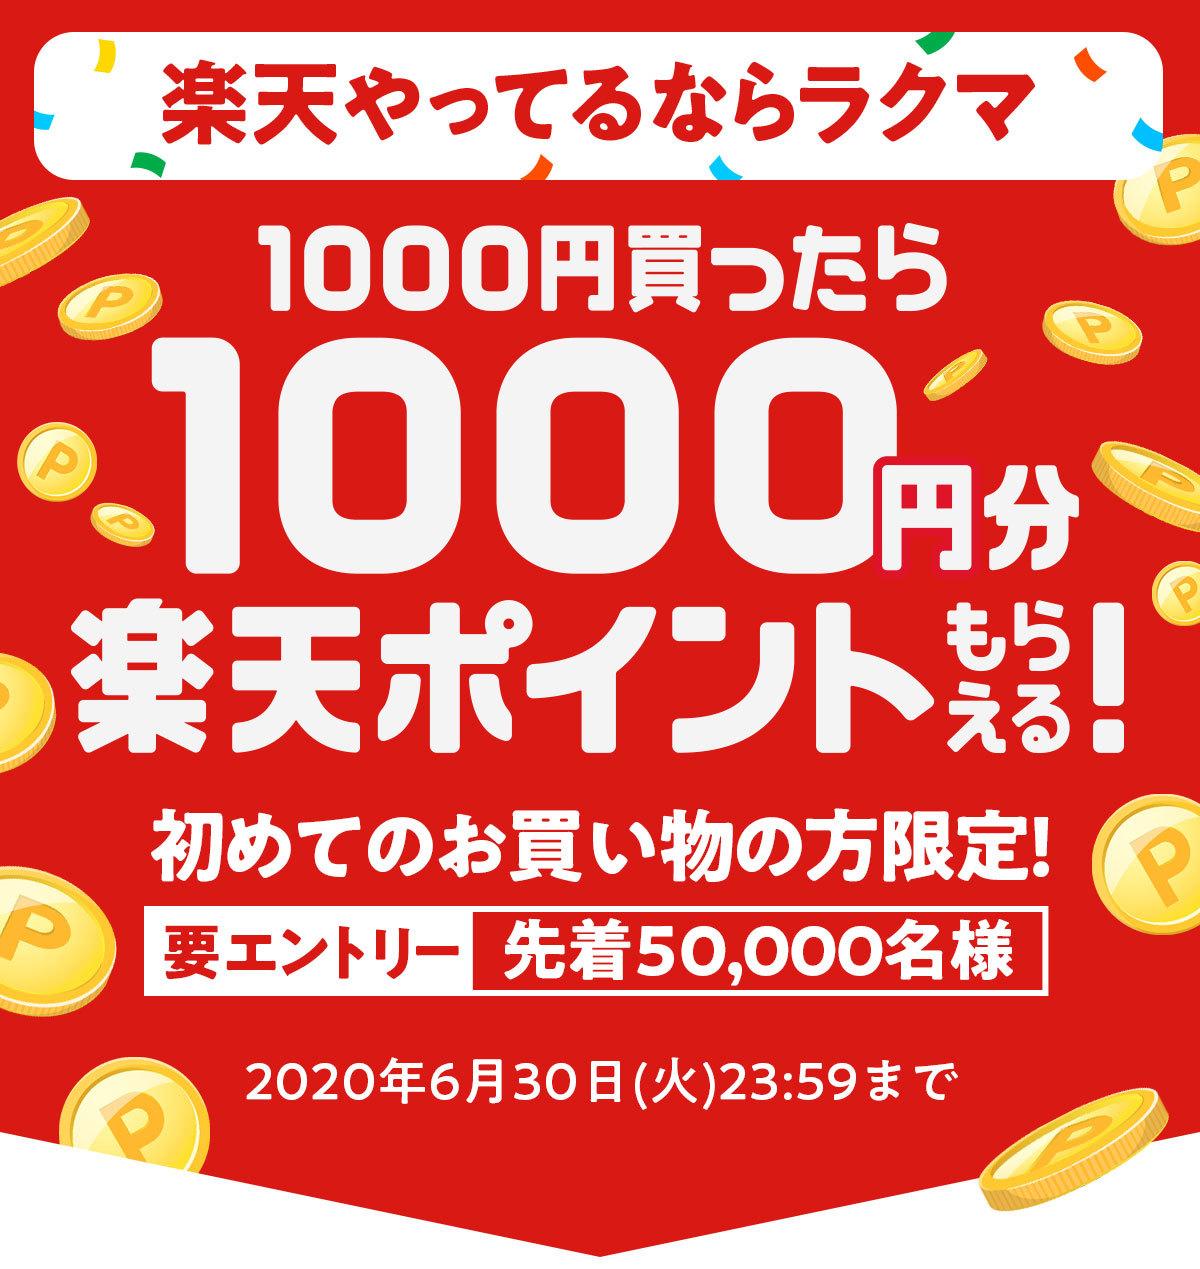 rakuma1000ymr206.jpg